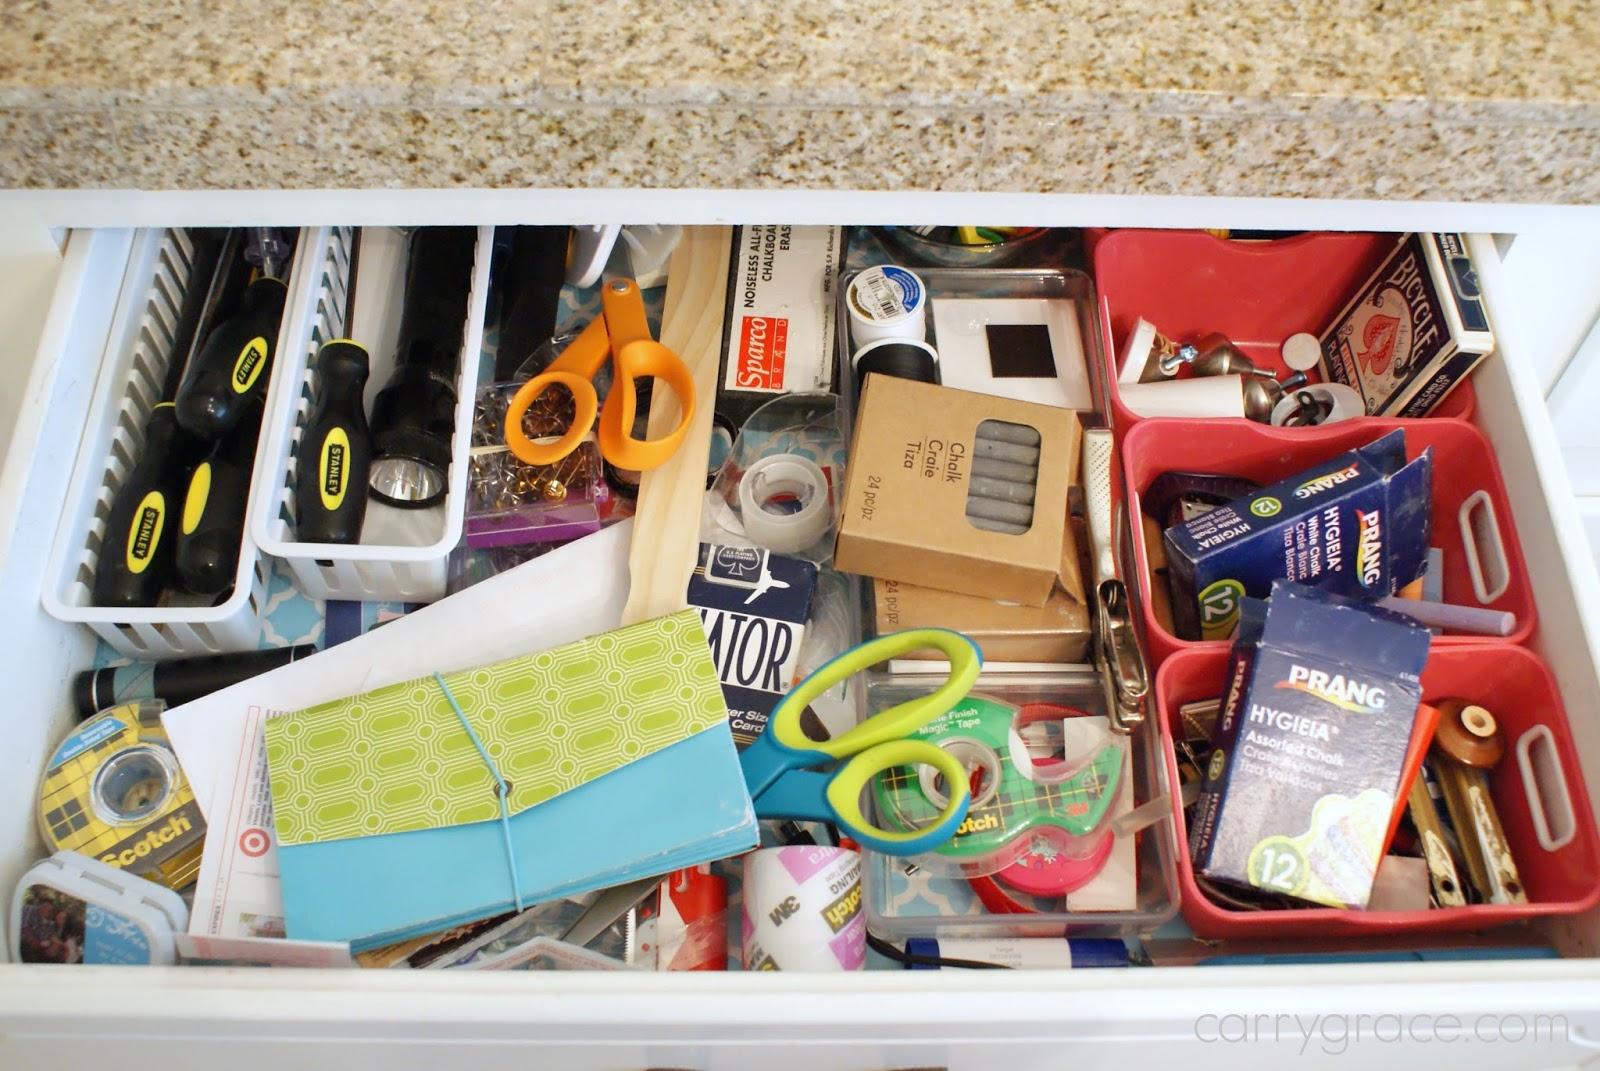 Carry grace organize it kitchen junk drawer desk drawer for Kitchen junk drawer